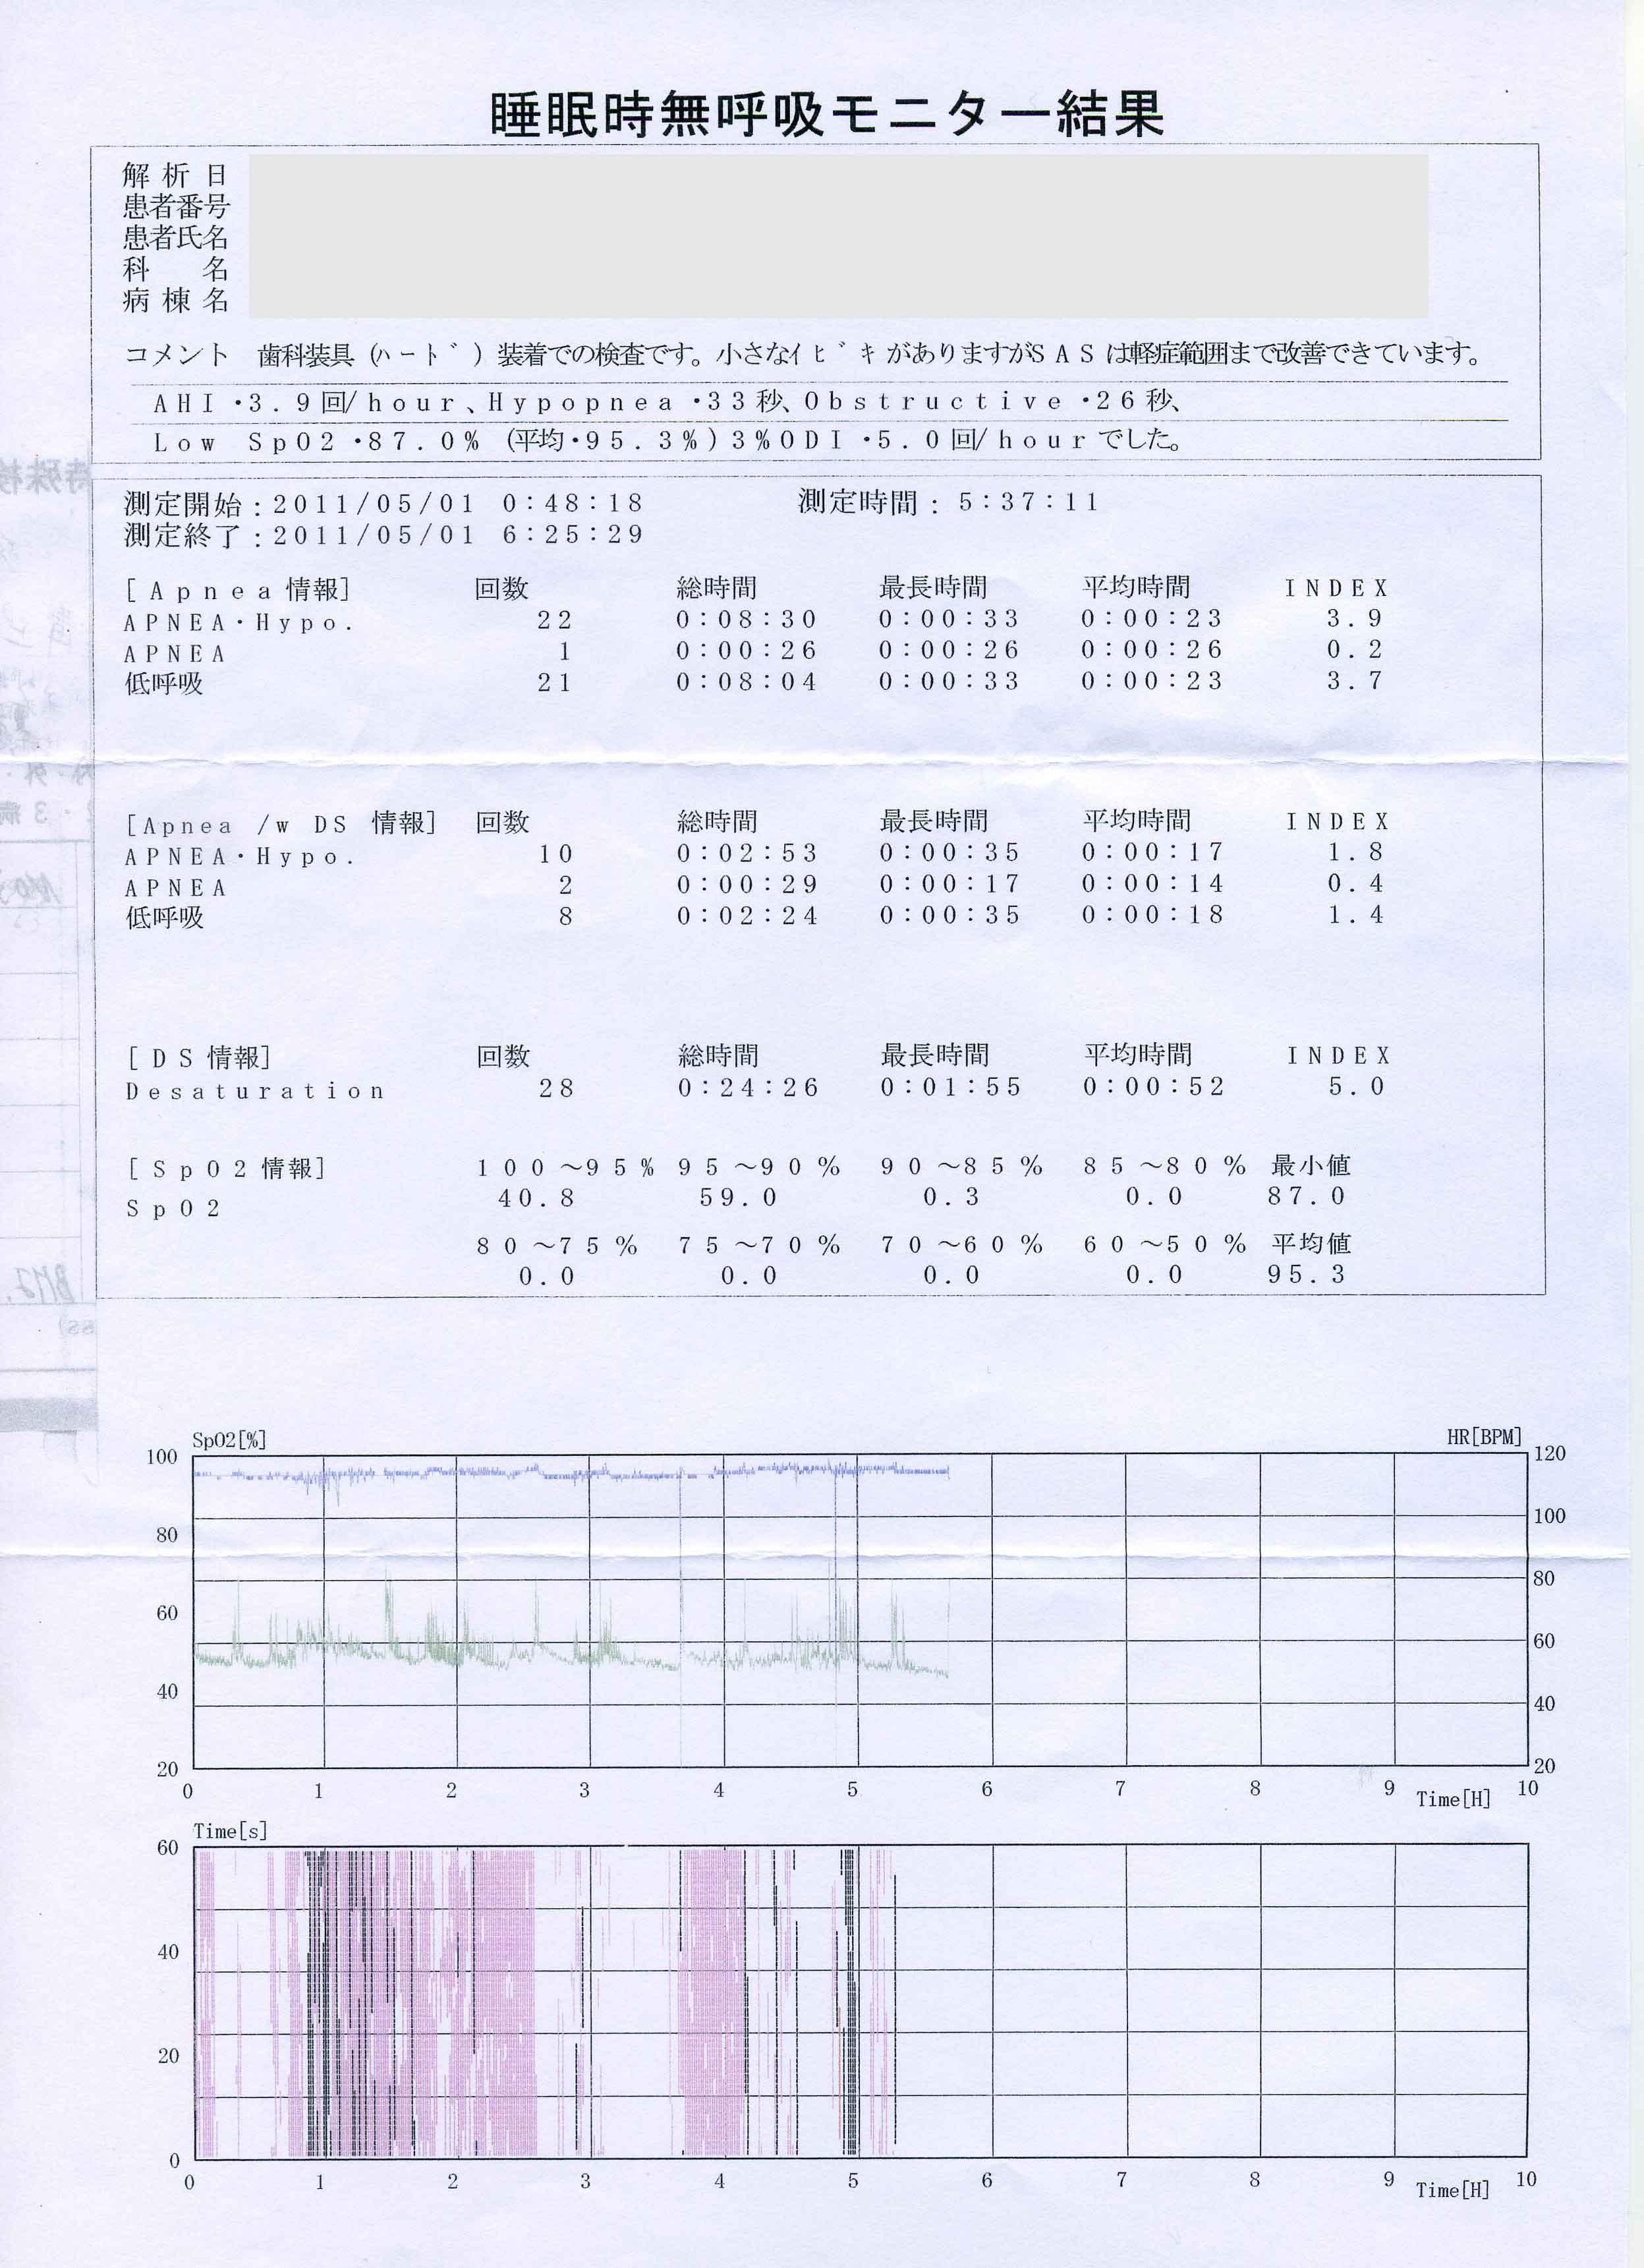 img057-1